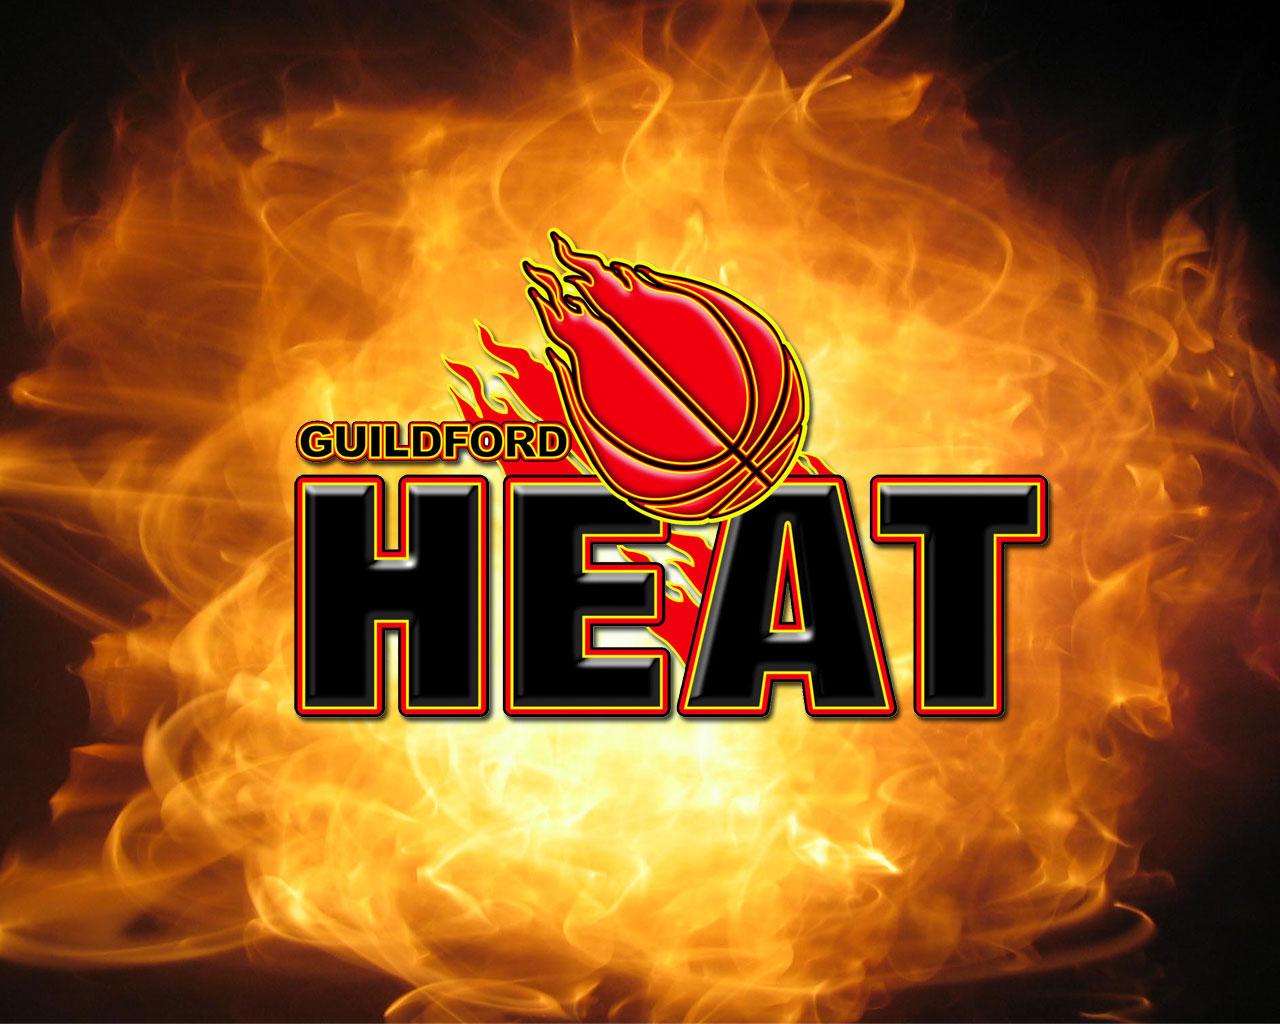 Guildford Heat Wallpap...